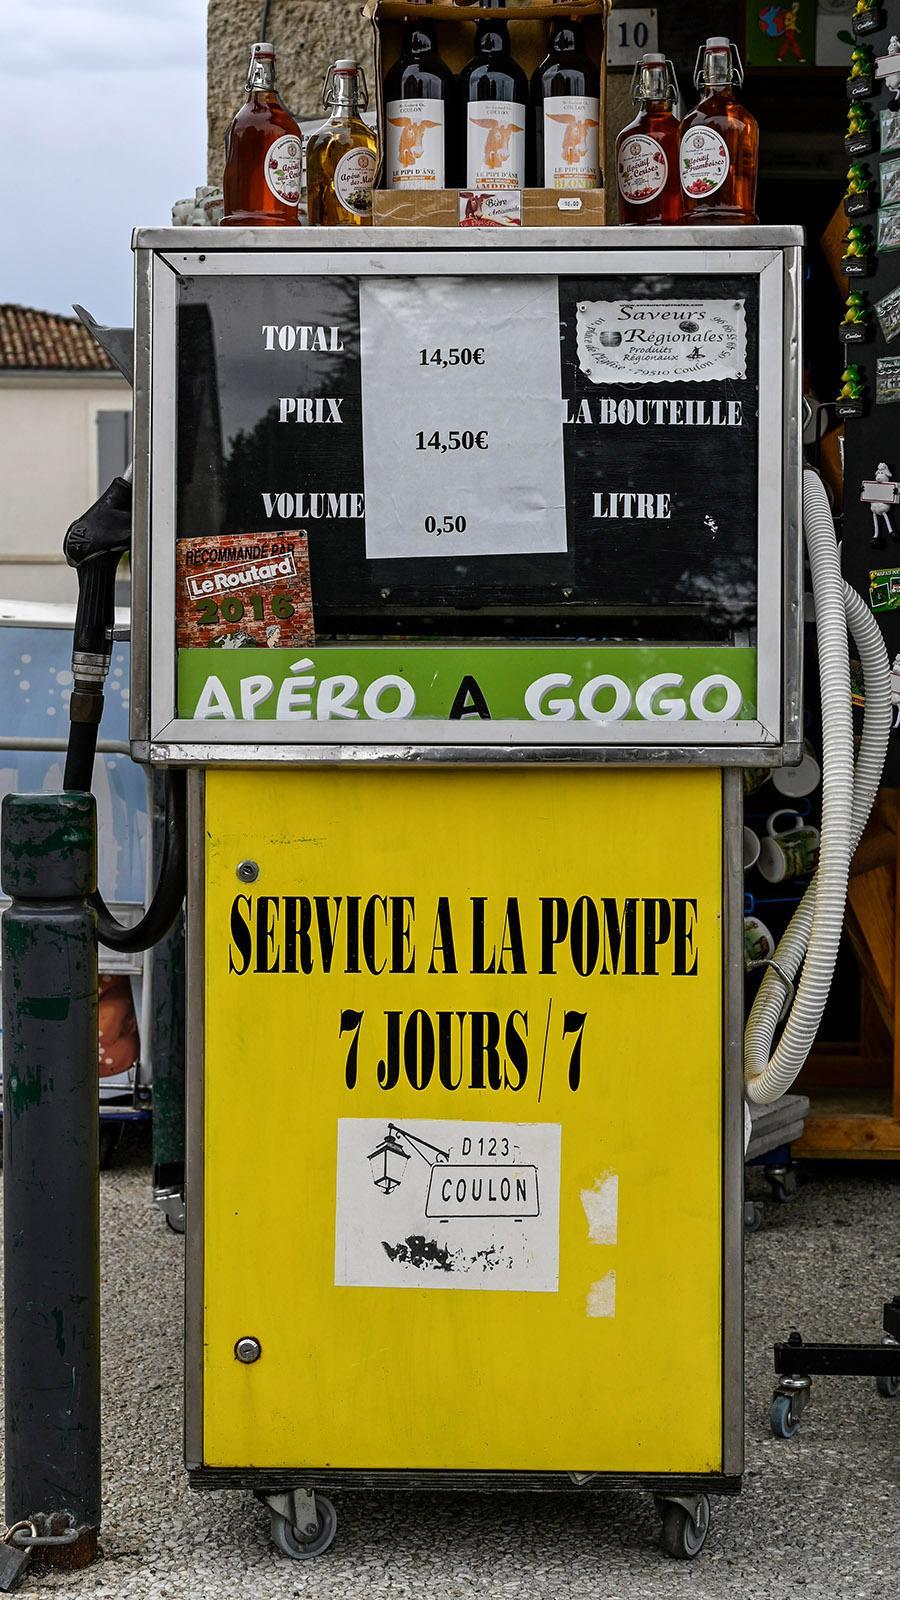 Apéro zum Selber-Zapfen –entdeckt in Coulon im Marais Poitevin. Foto: Hilke Maunder